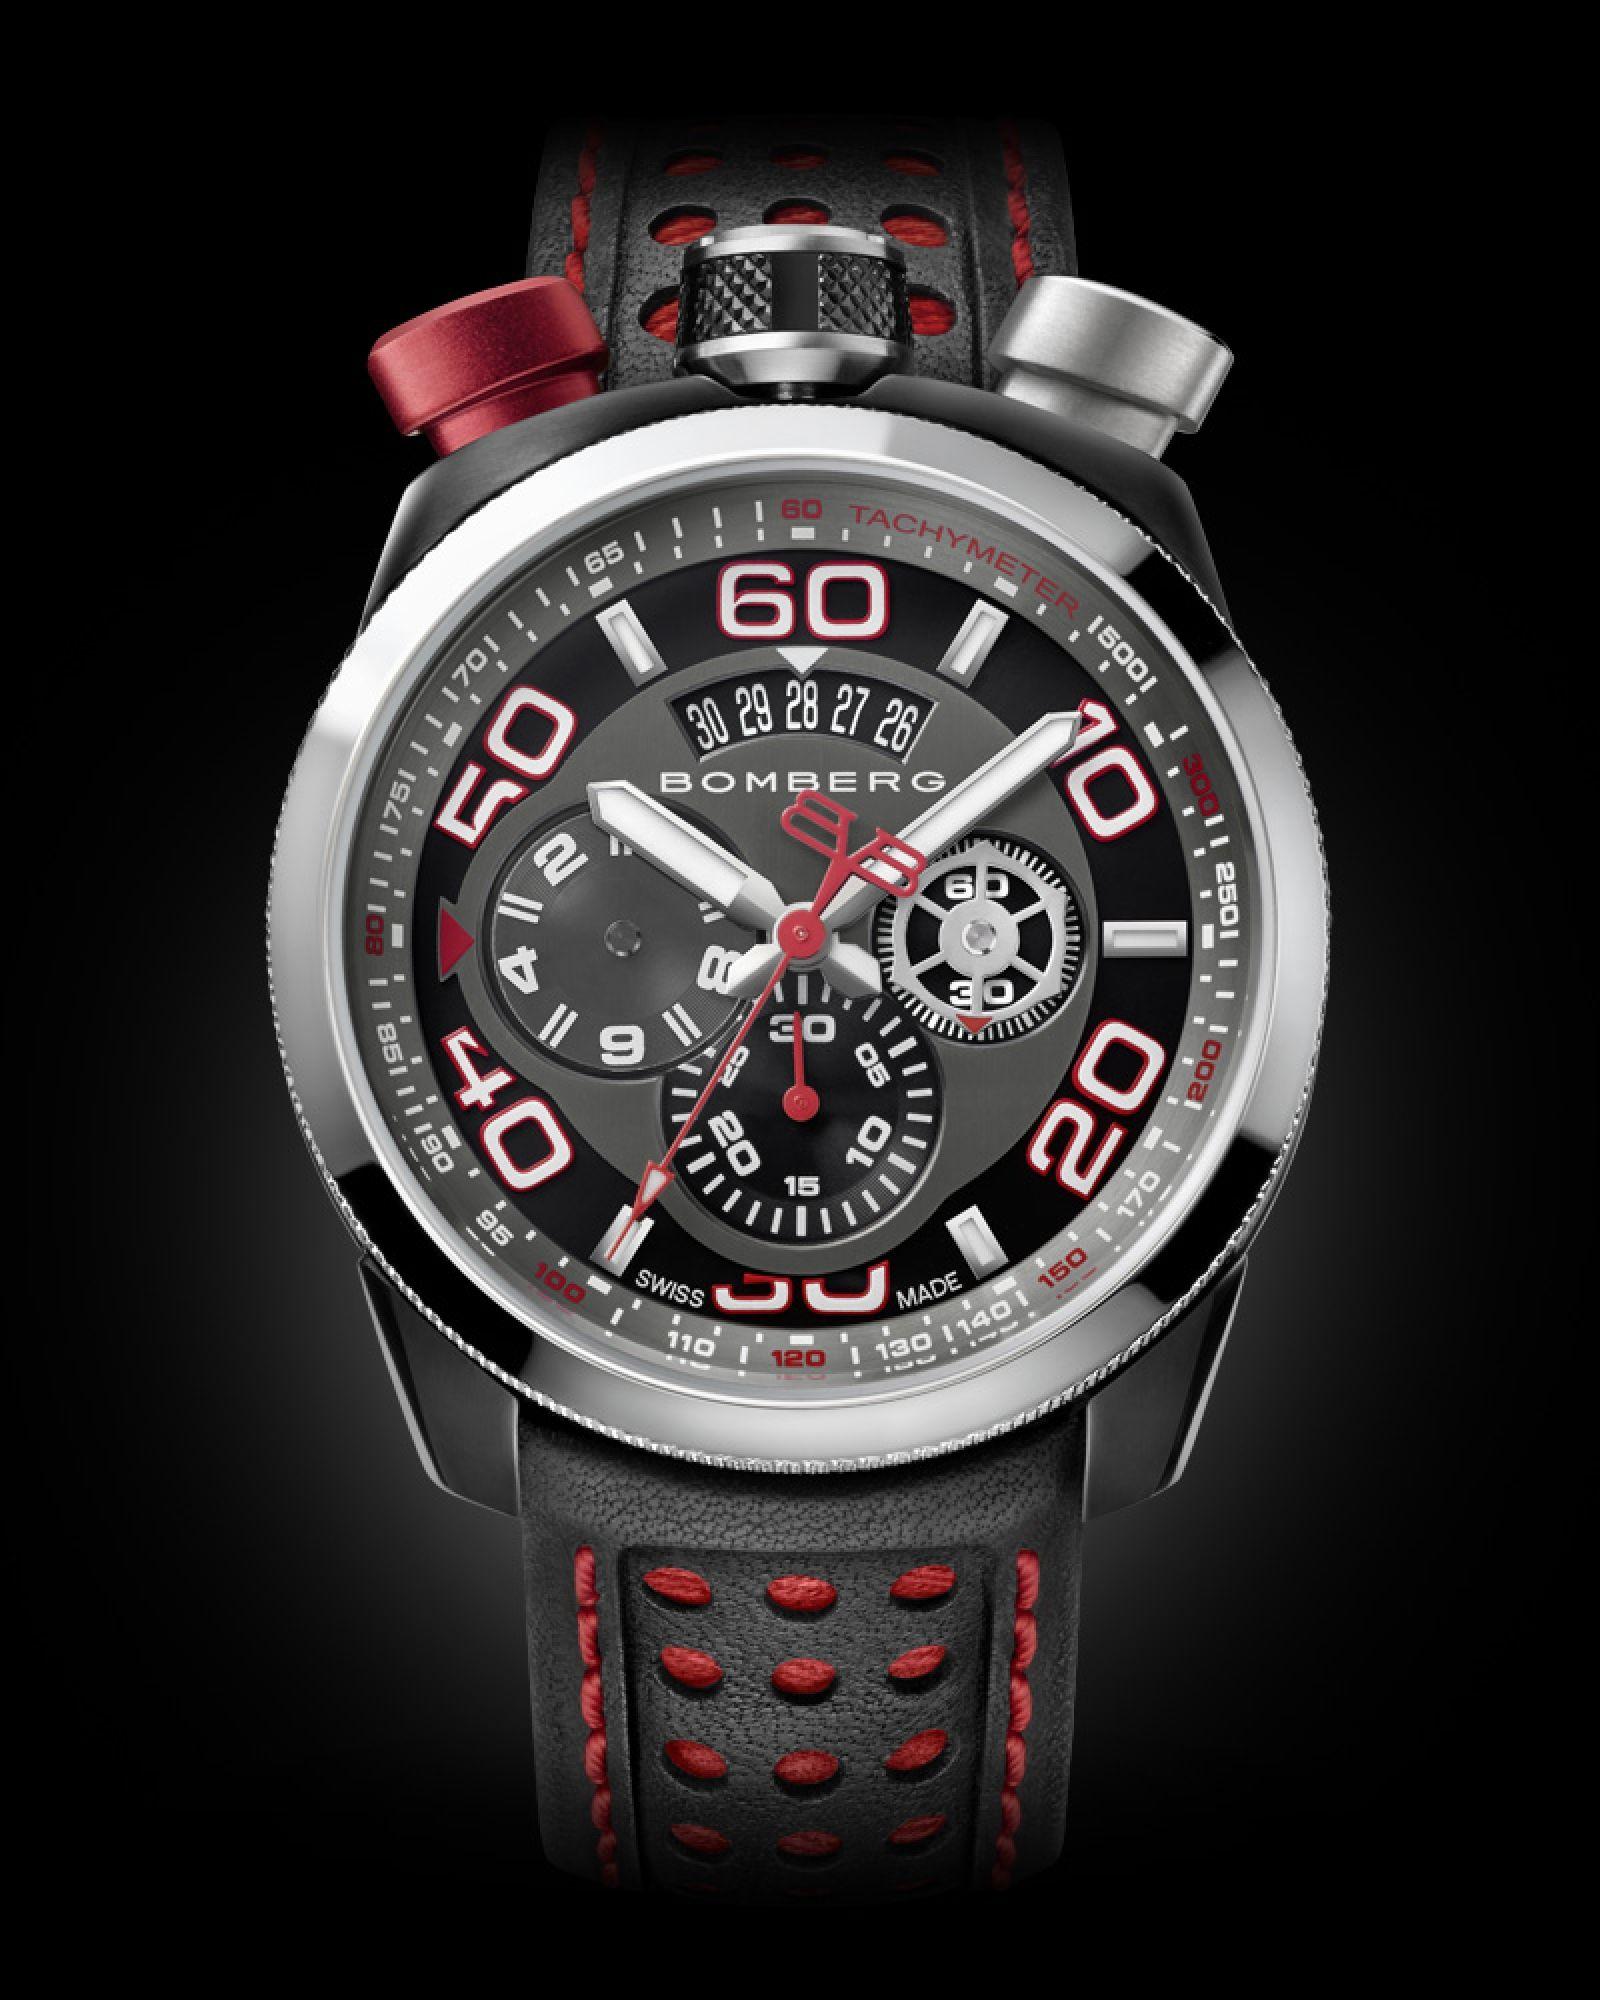 Bomberg BOLT-68 - BS45CHSP.011.3 Reloj Tiempo ec0bf8f9282a